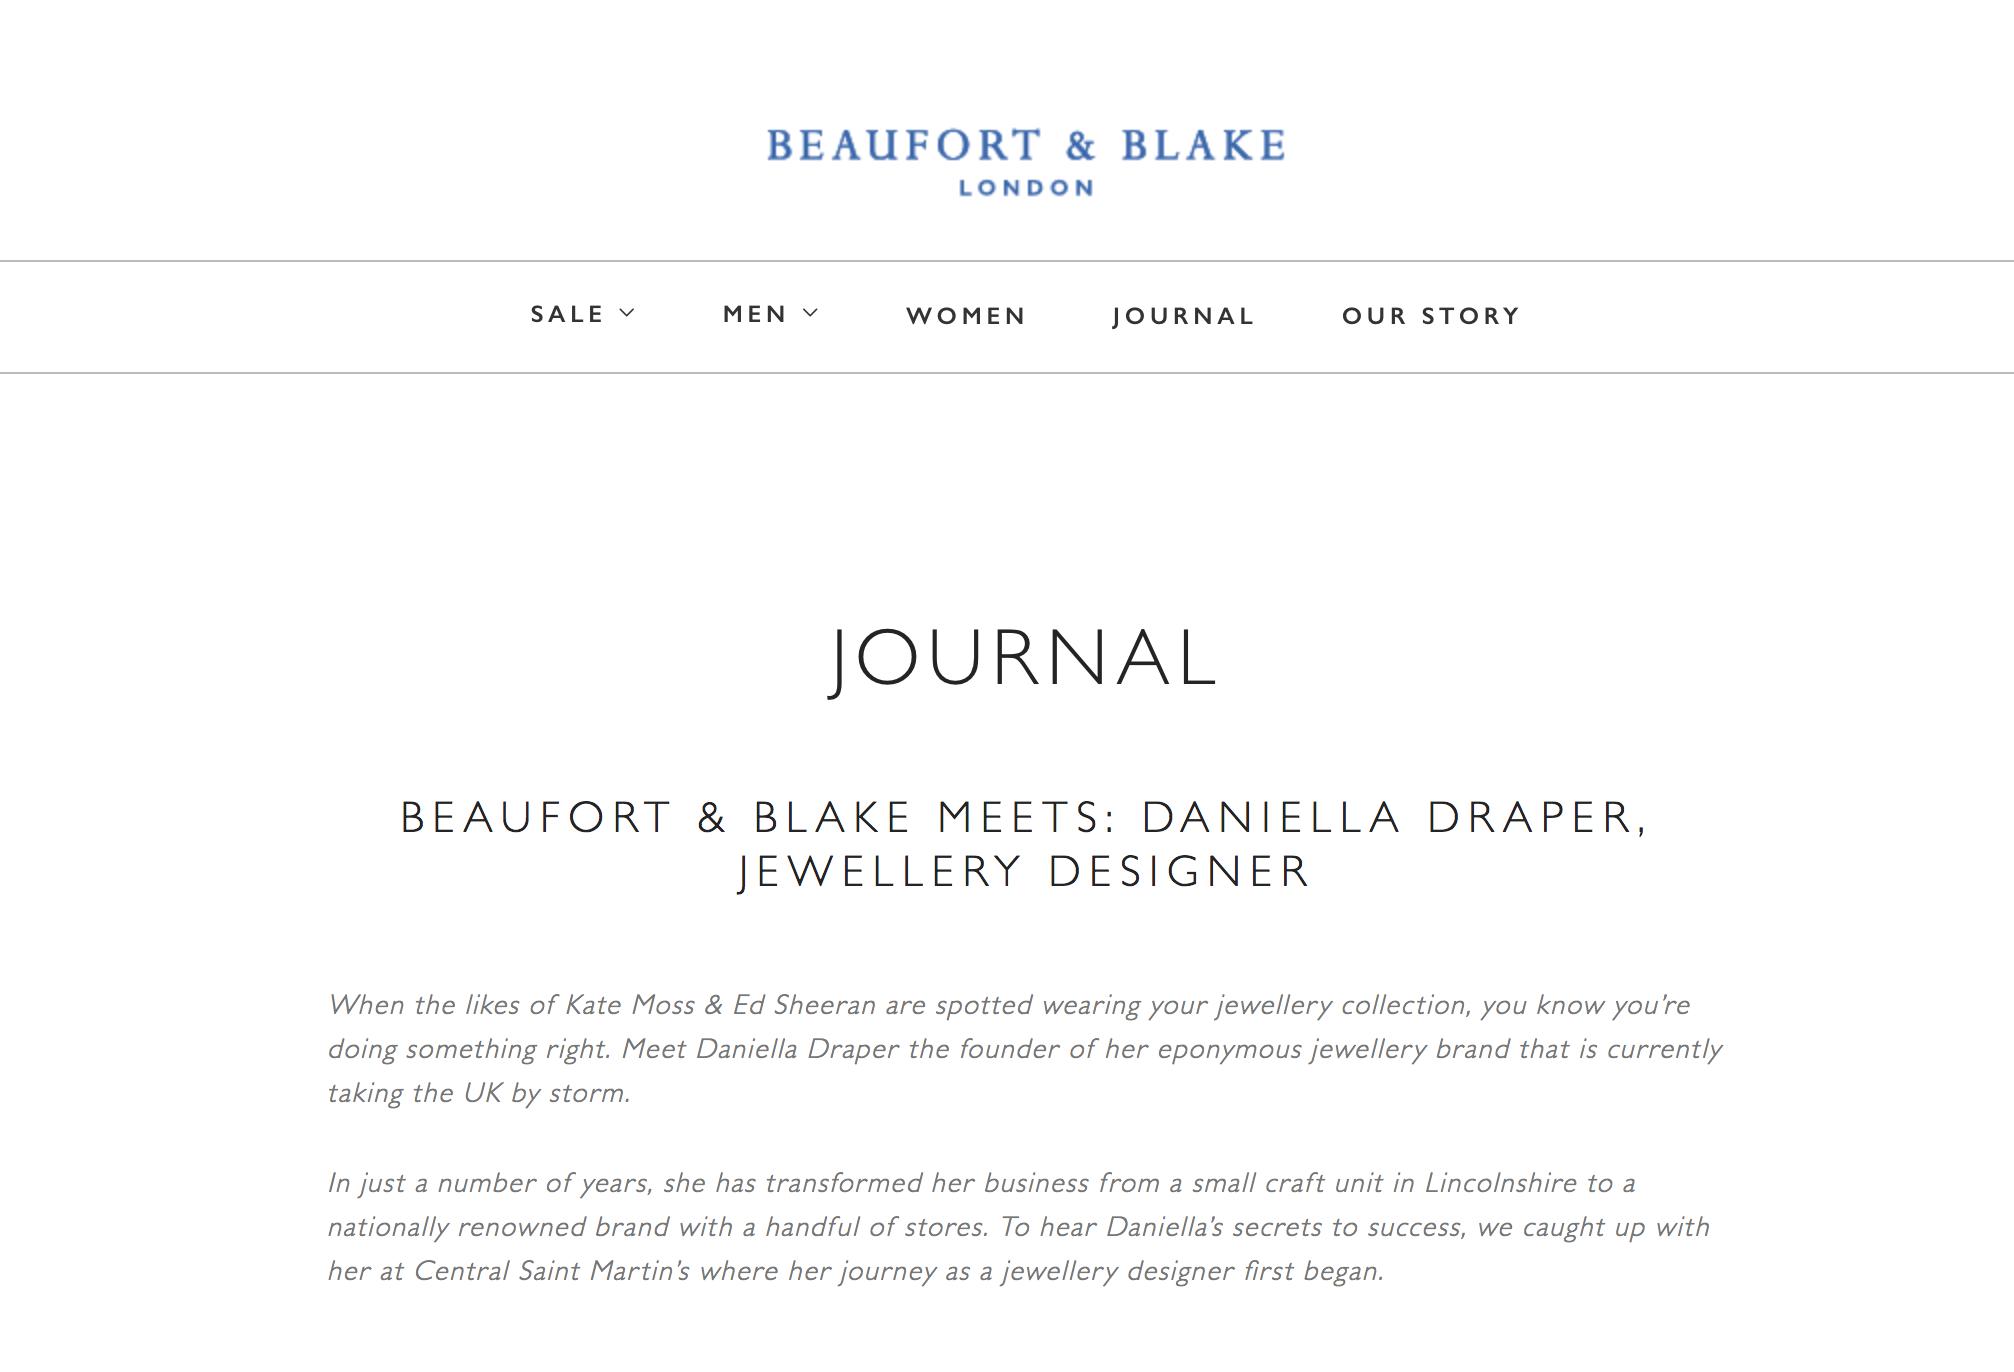 Beaufort & Blake, Daniella Draper